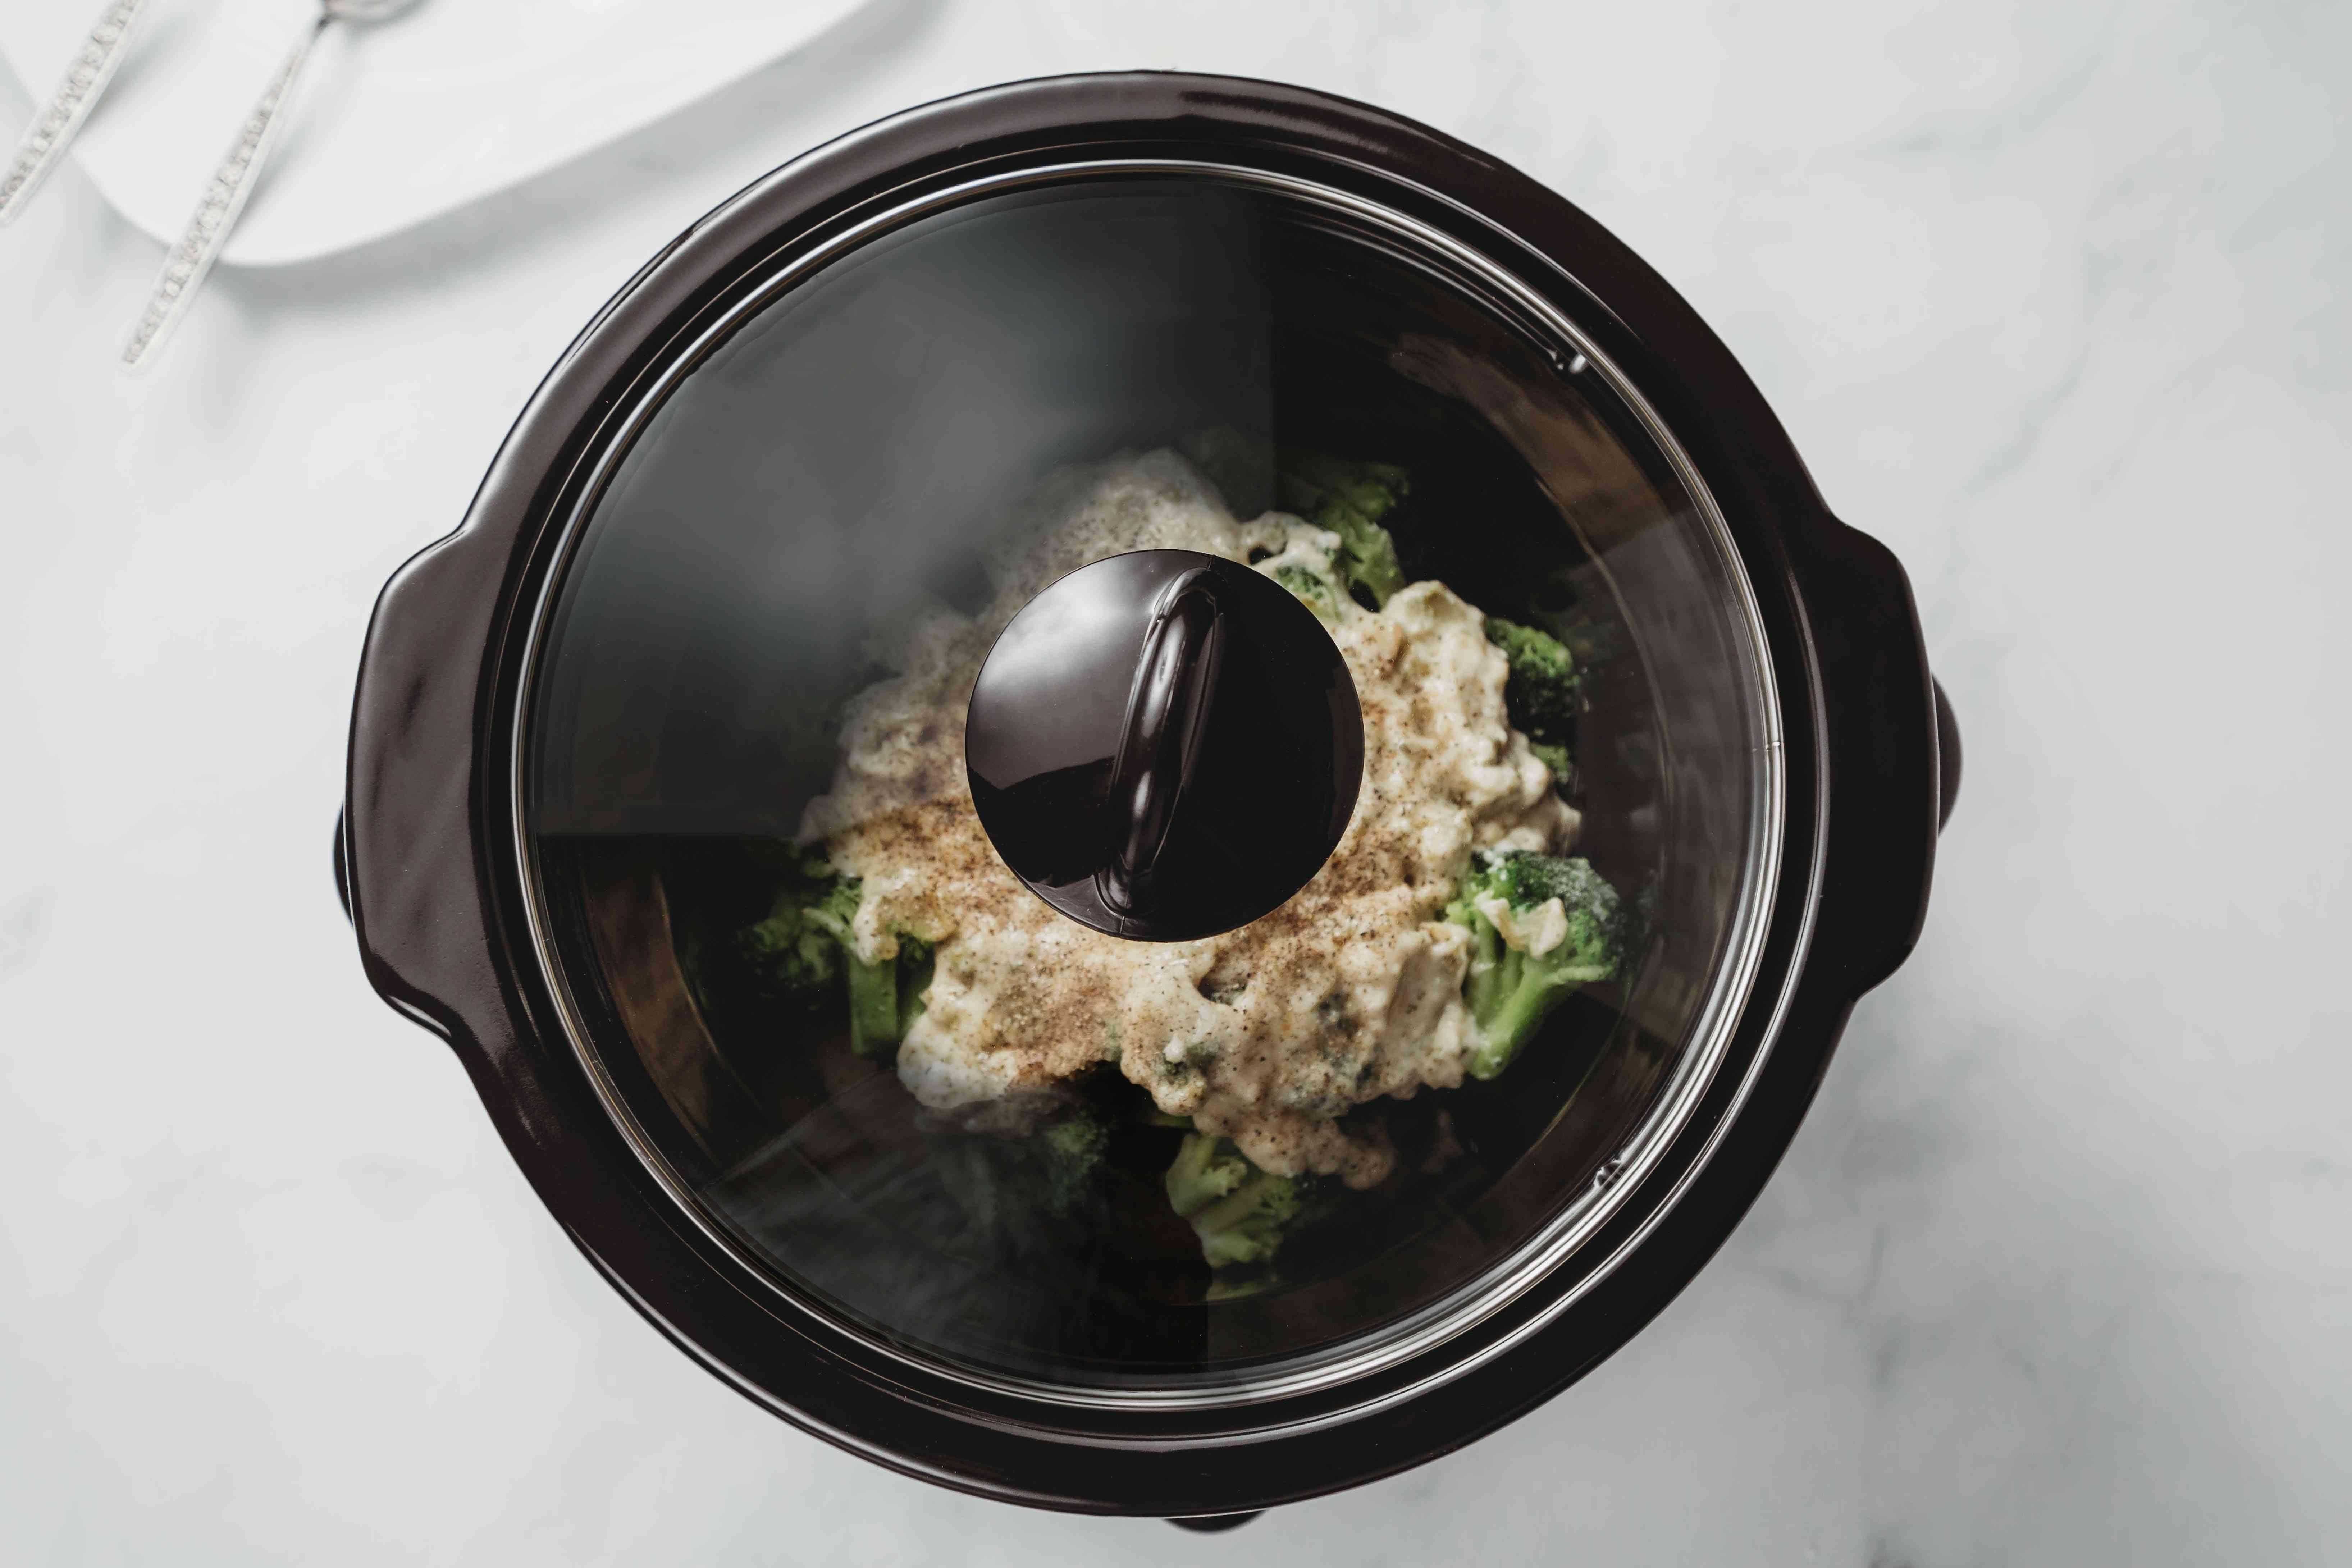 ingredients in a crock pot